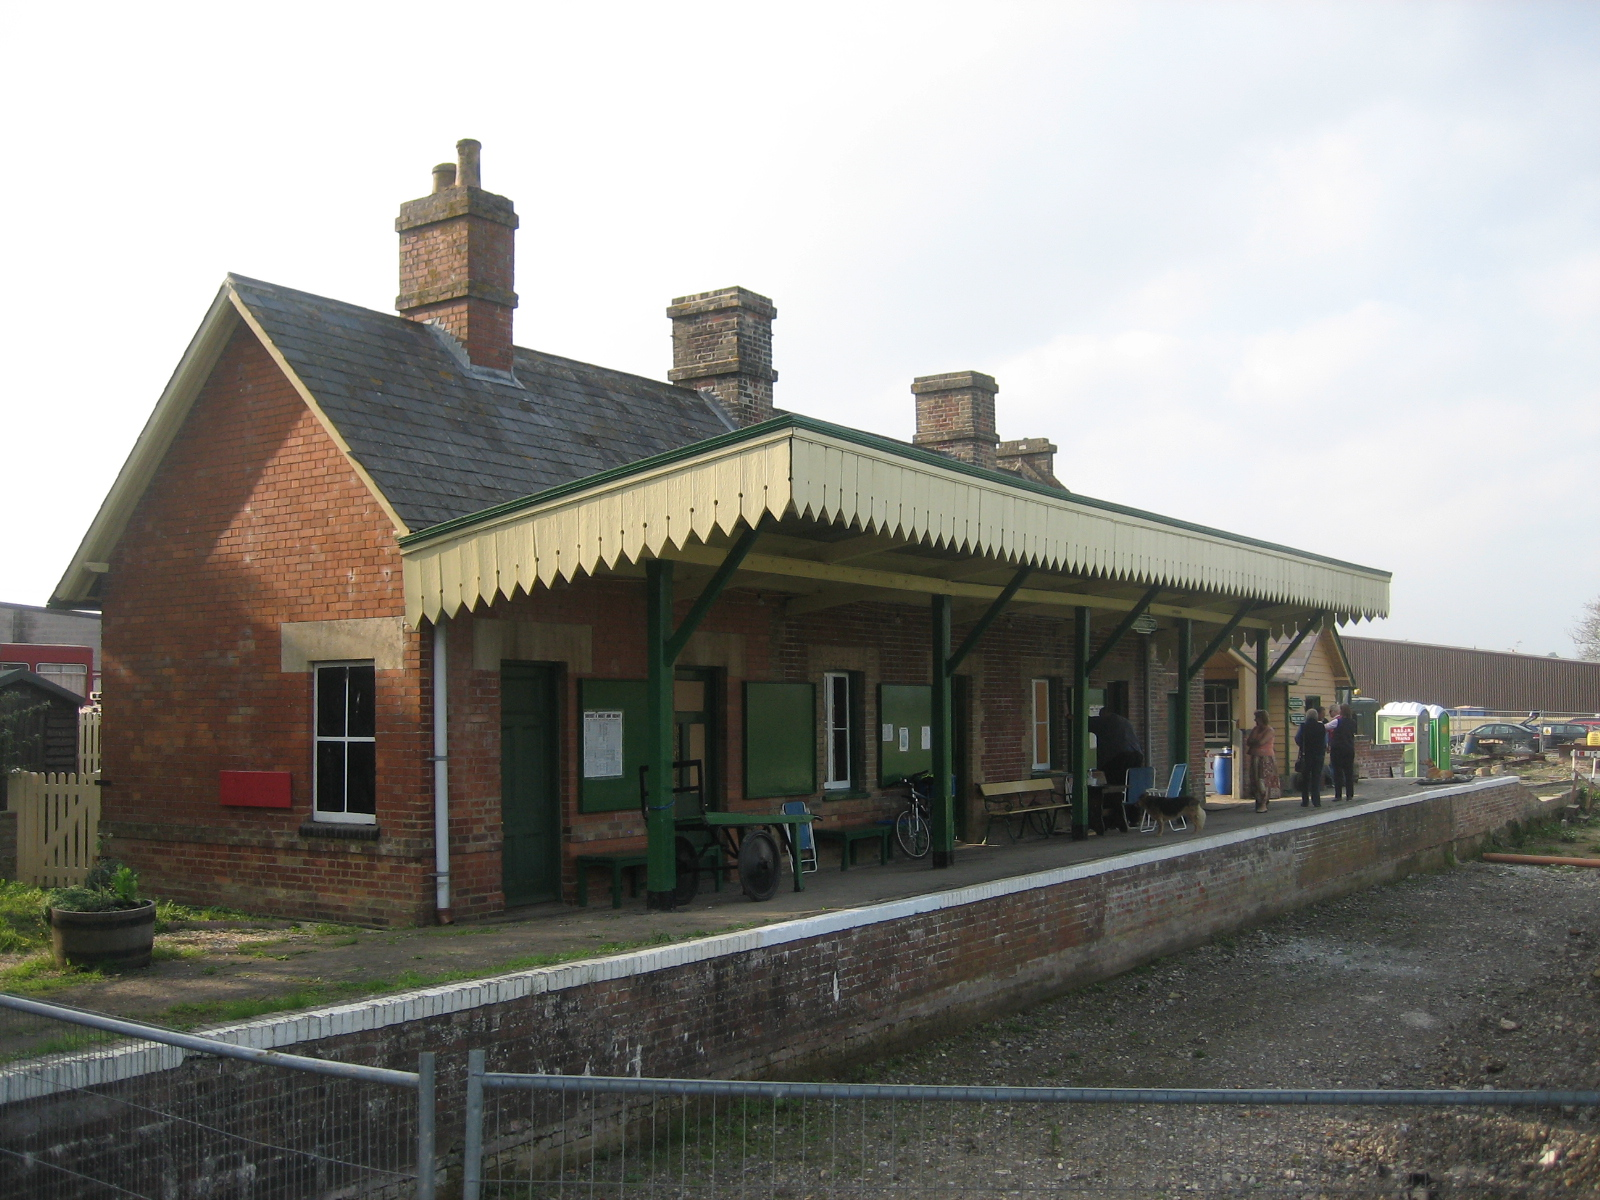 6 Blandford S/&DJR. Sturminster Newton Shillingstone Railway Station Photo